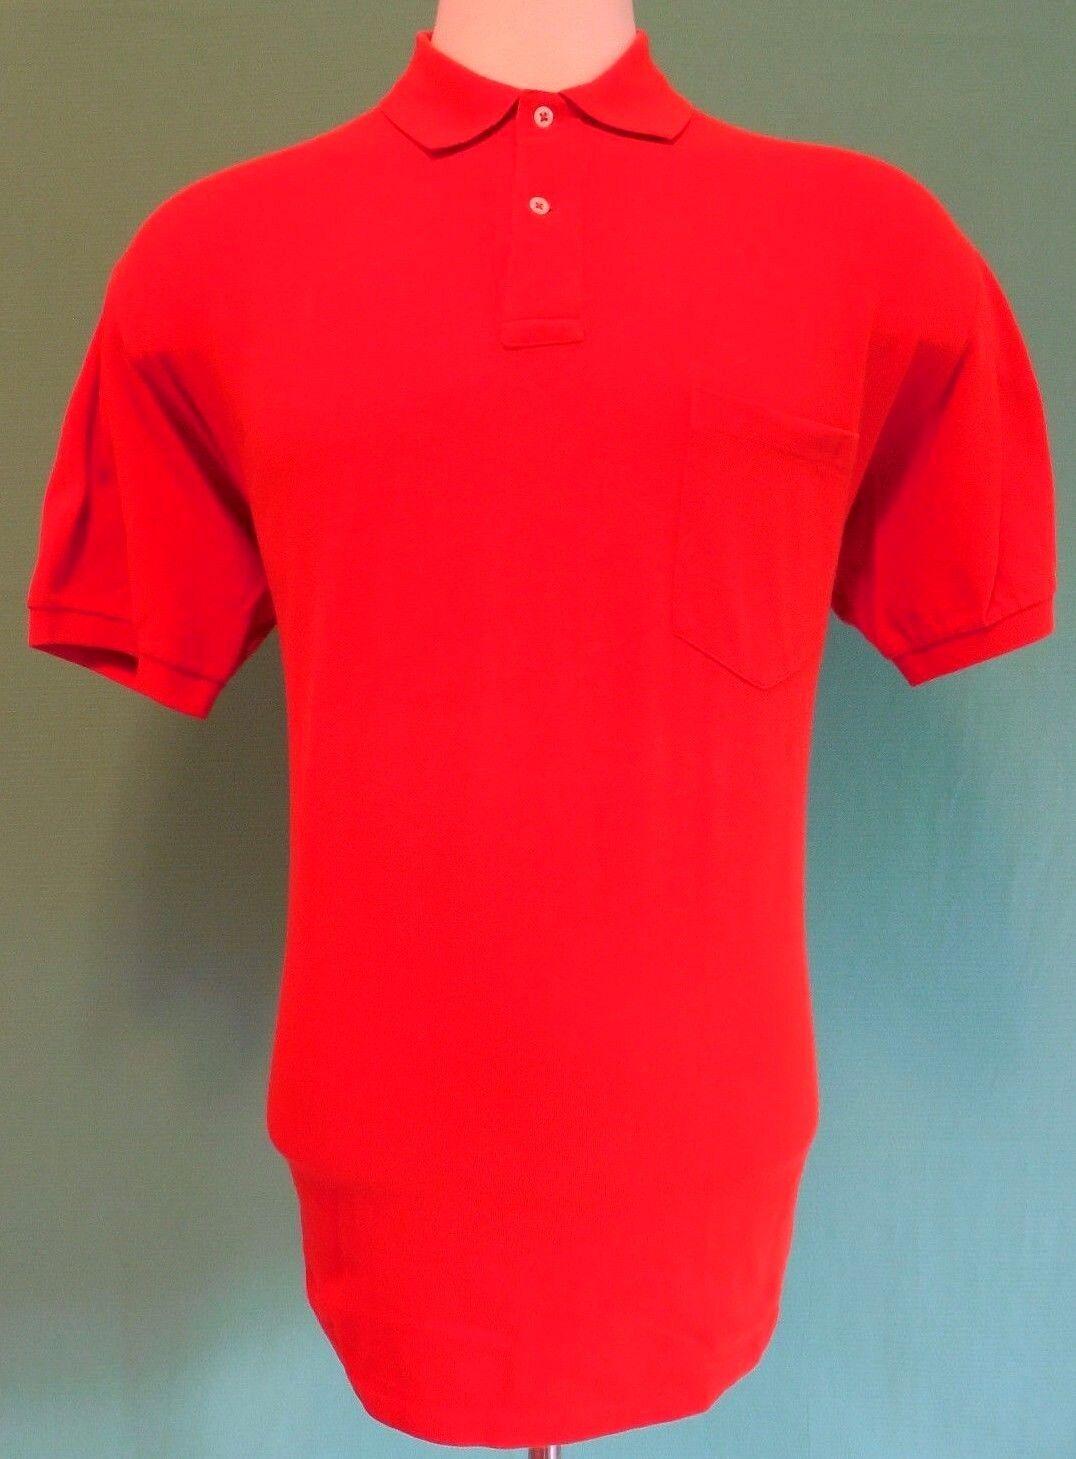 237d6f8a Polo Ralph Lauren Polo Shirt orange Mens Cotton Vintage USA Pony Large Sz  Size L nsgsxc3096-Casual Shirts & Tops